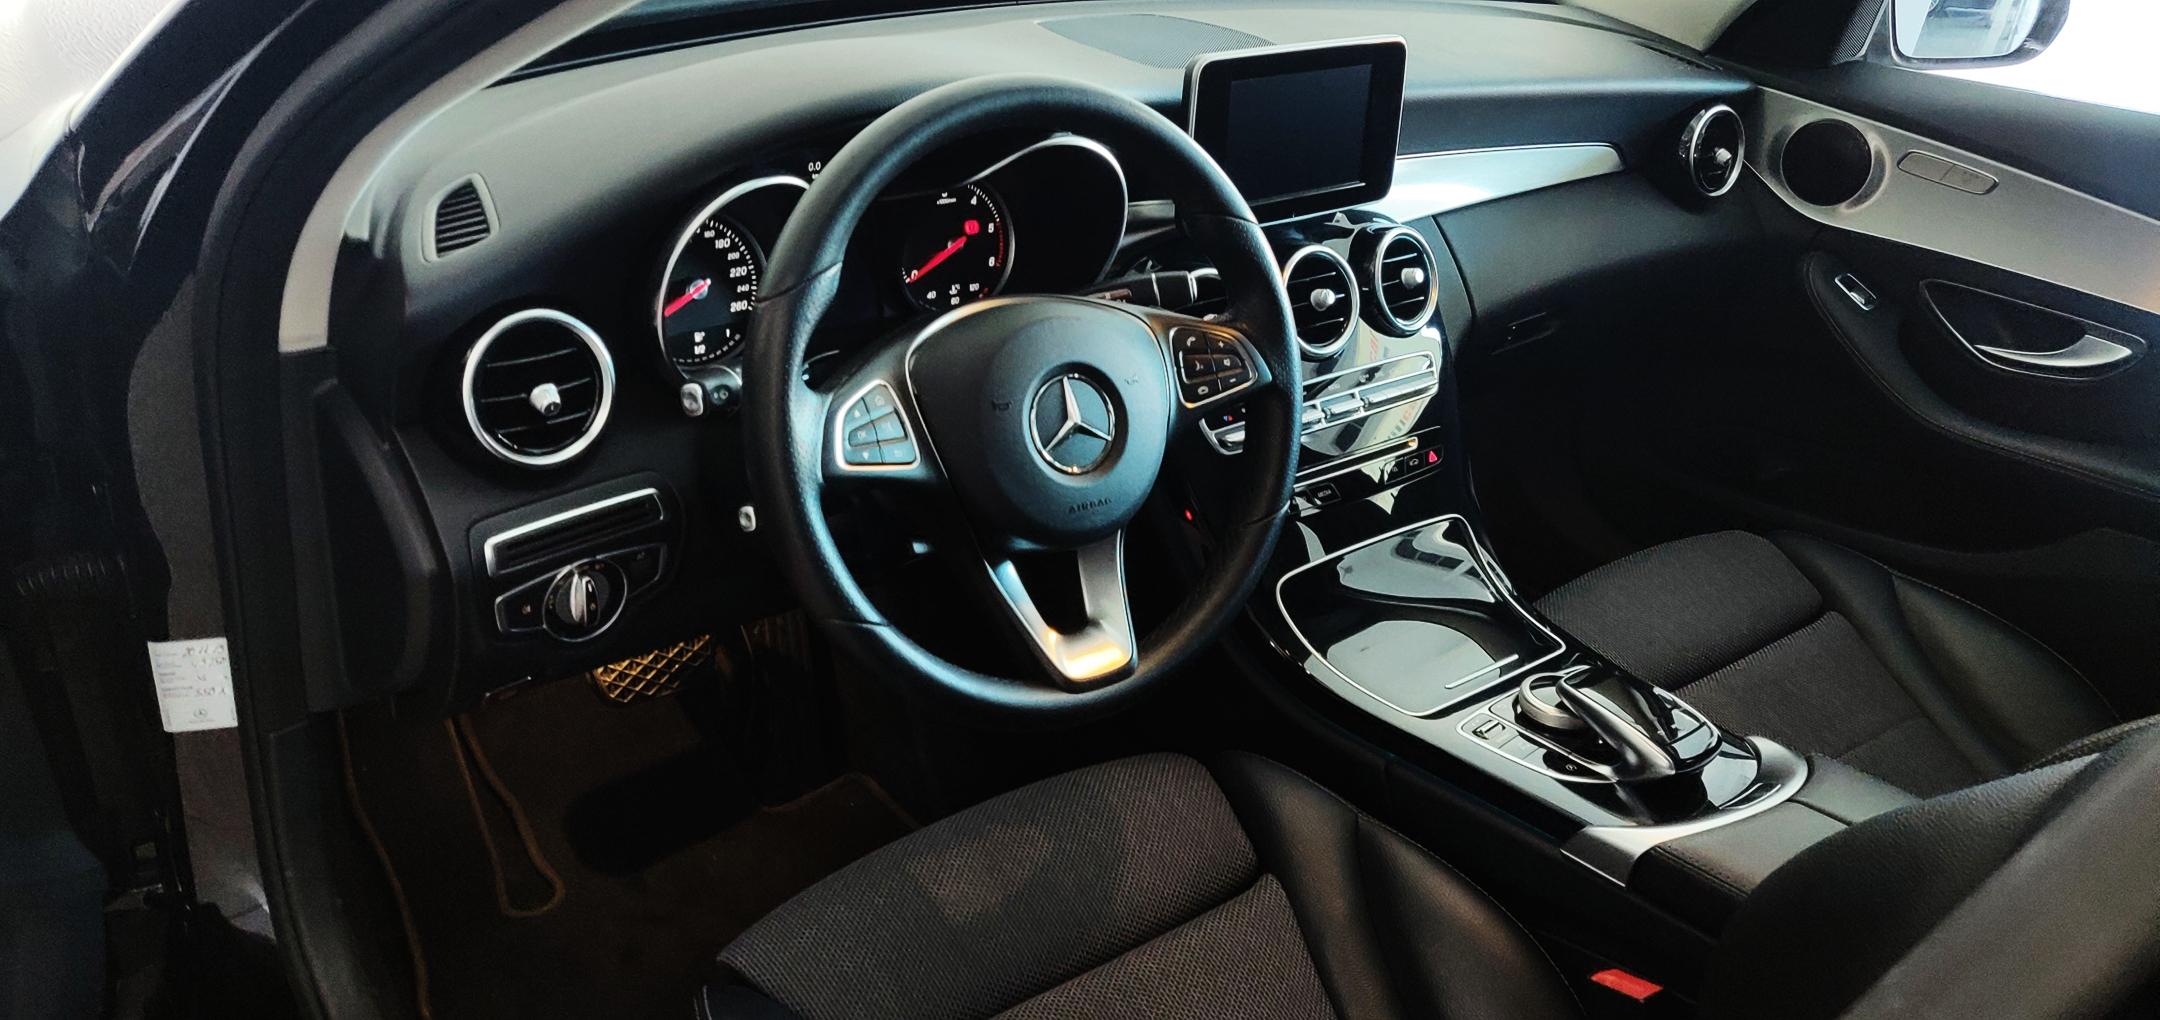 Mercedes-Benz C 220 Avantgarde | Imagem 14